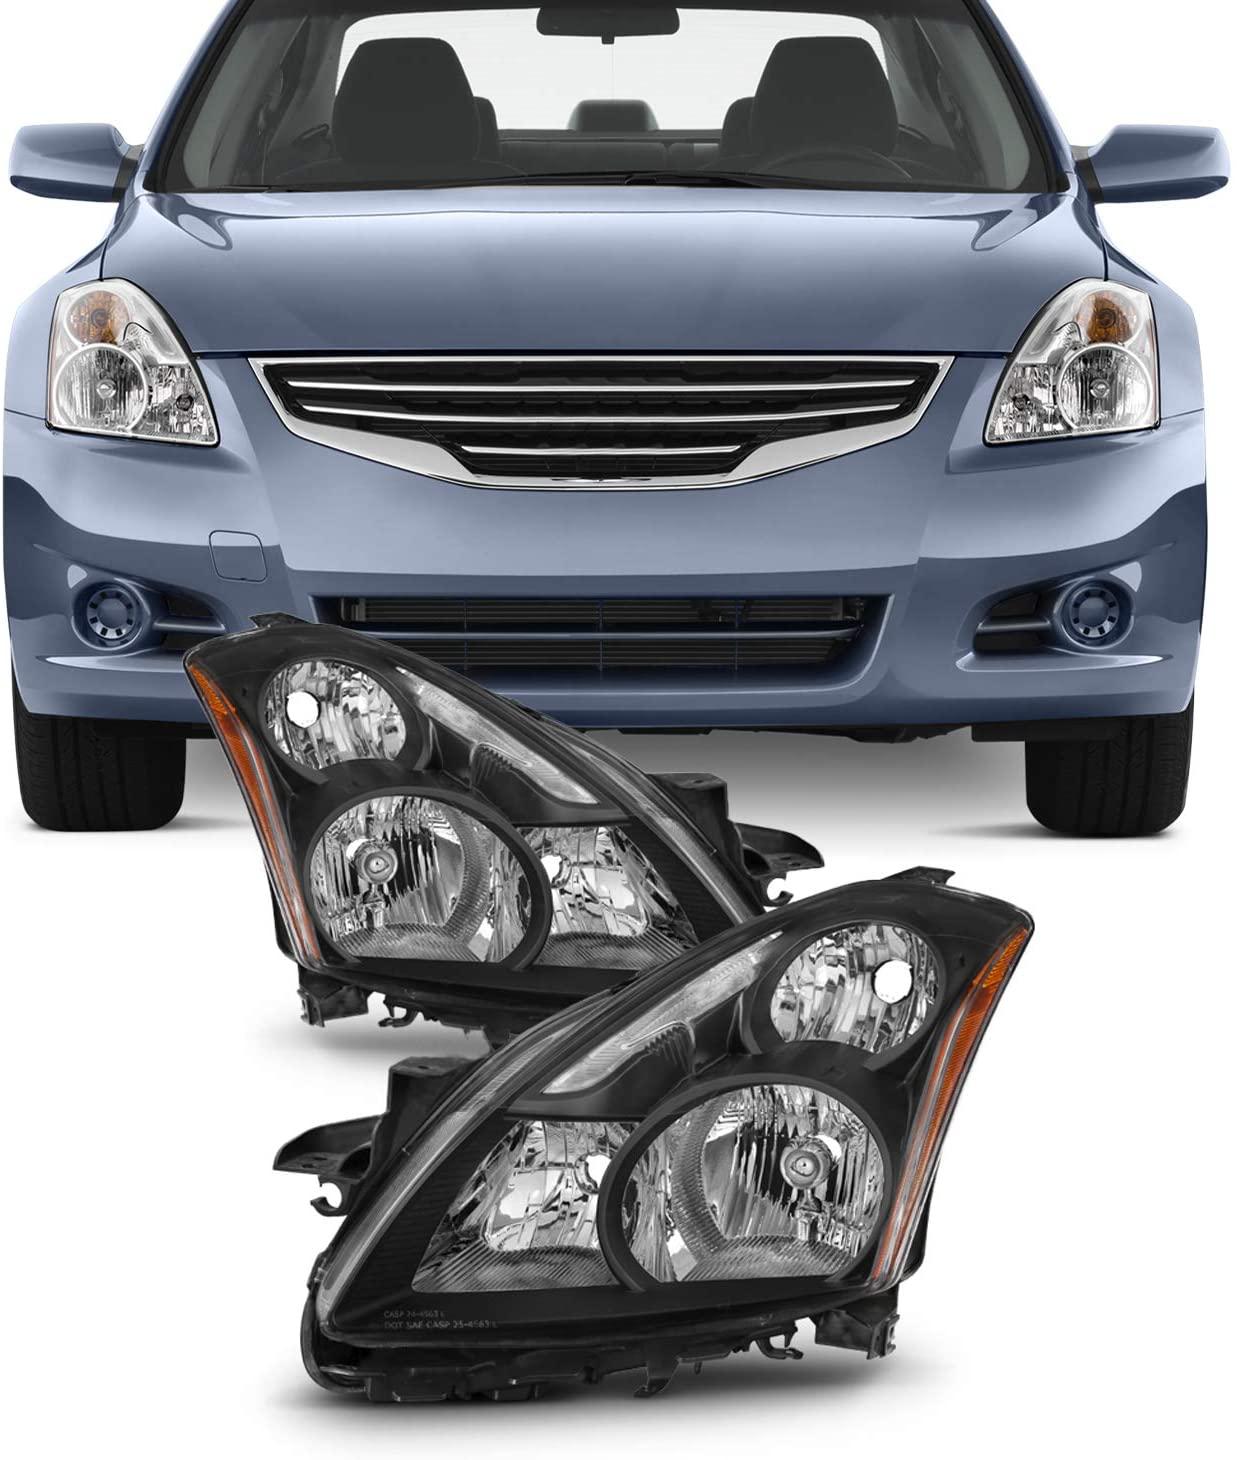 For Black 10-12 Altima 4 Doors Sedan Halogen Type Headlights Front Lamps Replacement Pair Left + Right